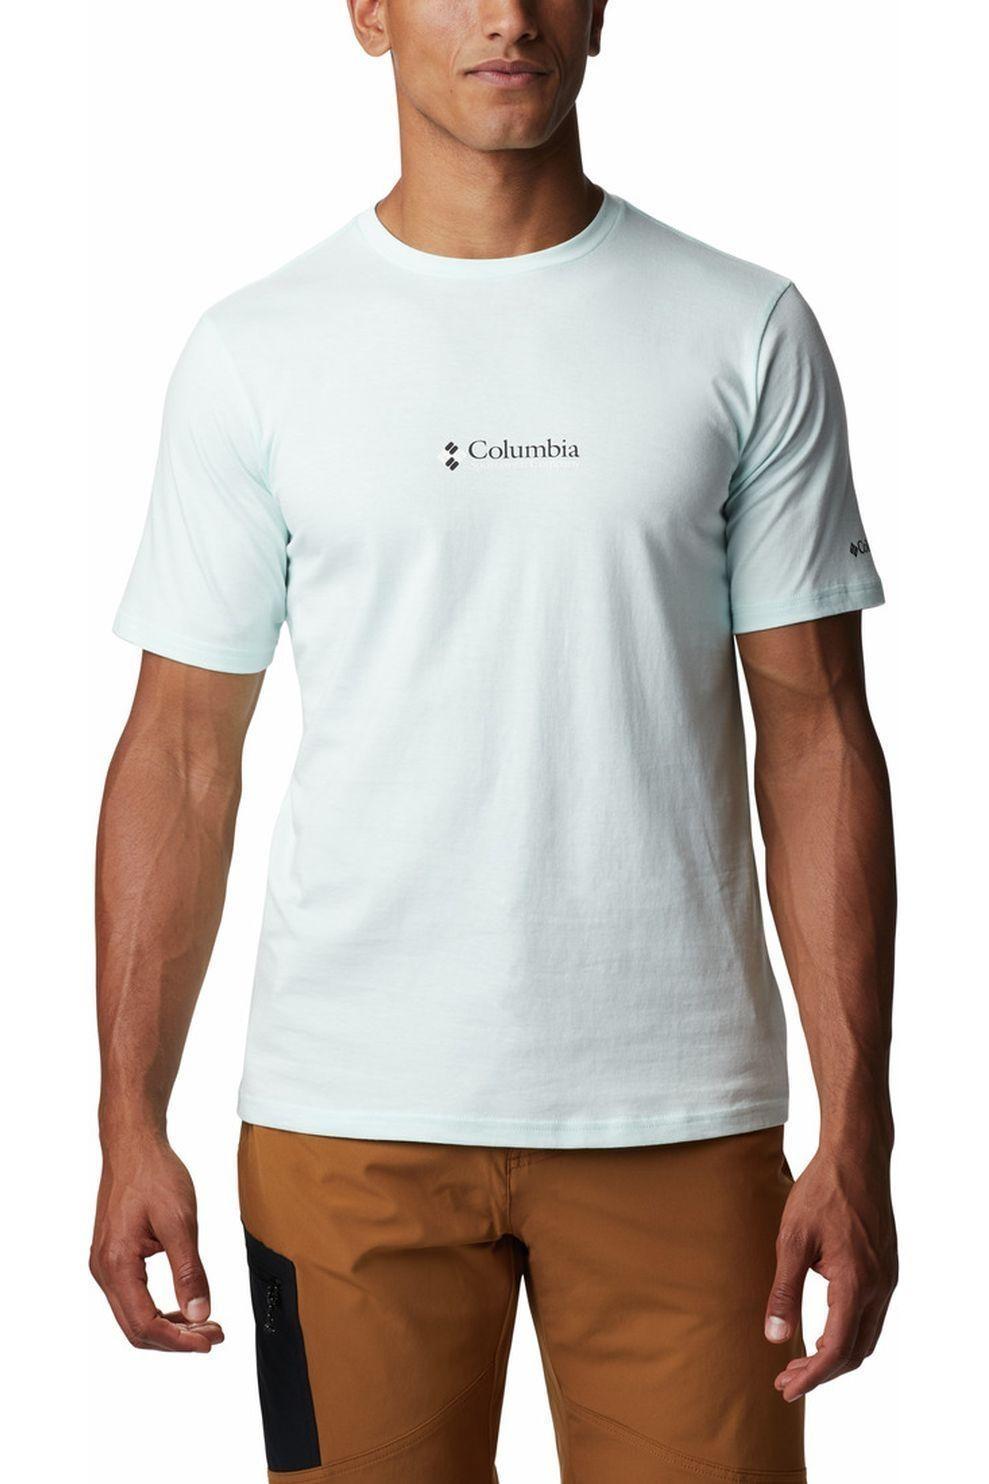 Columbia T-Shirt CSC Basic Logo voor heren - Indigo Blauw - Maten: S, XXL